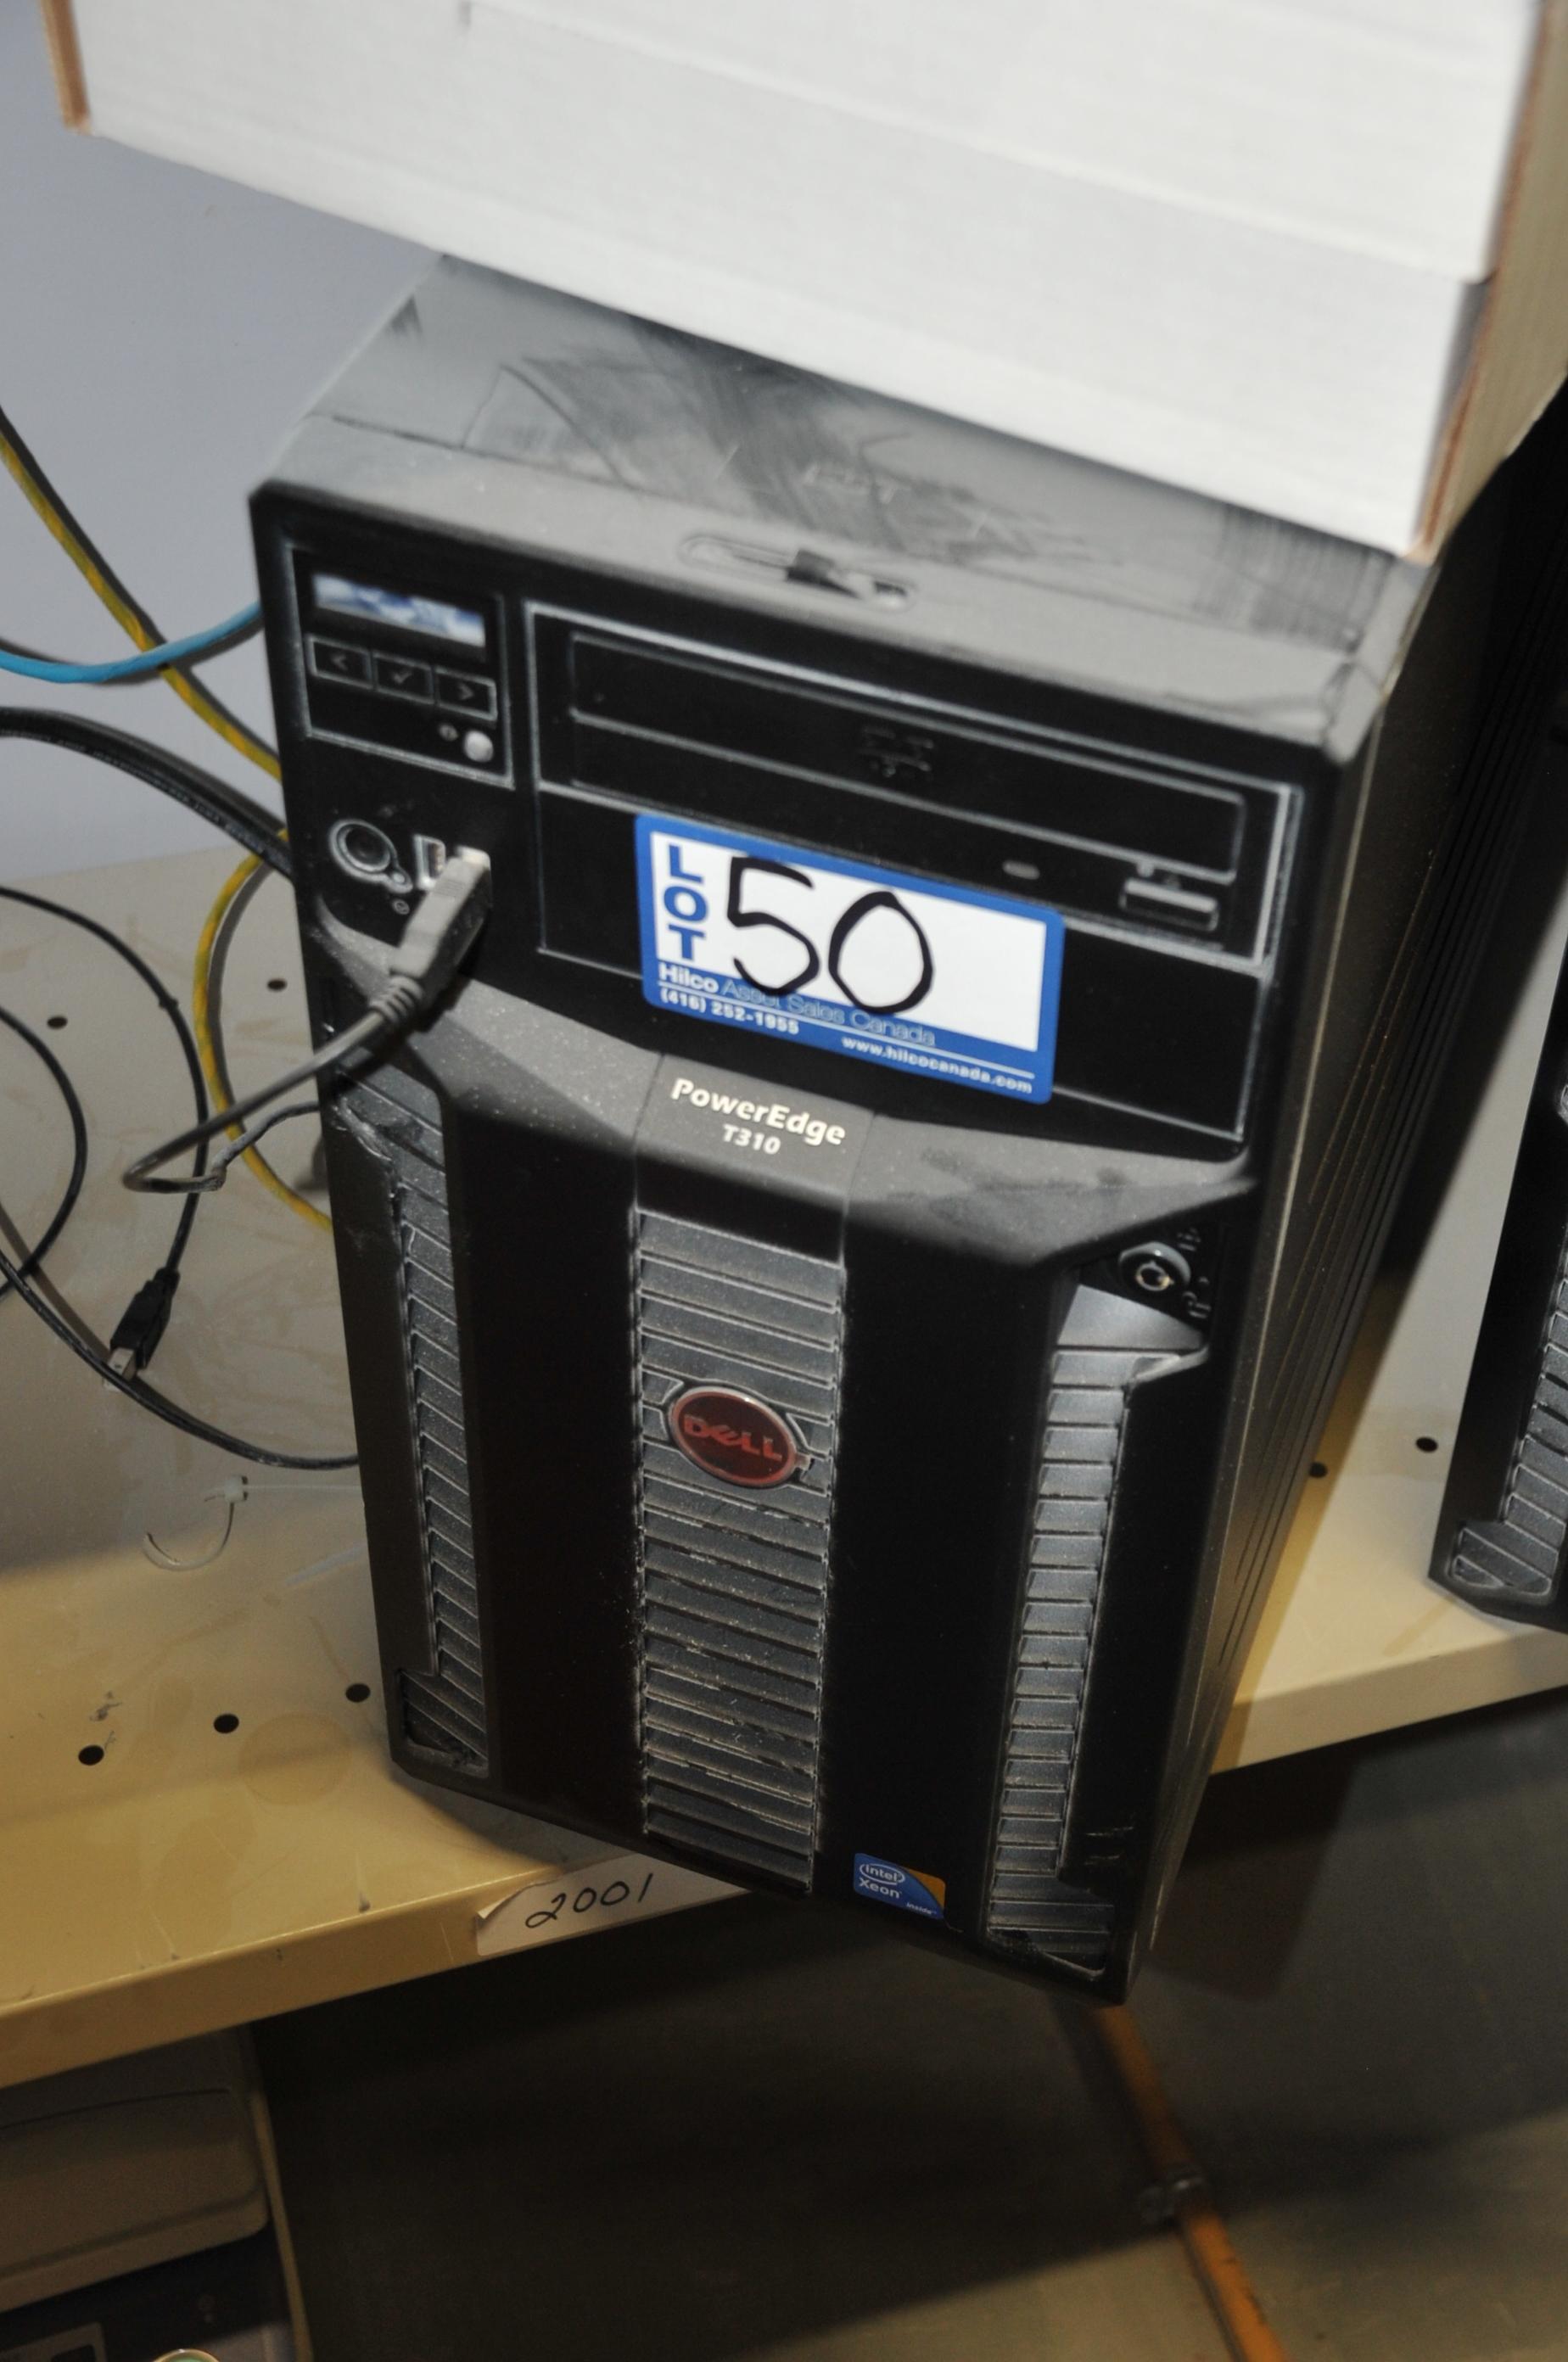 Dell Model PowerEdge T310 Xeon Server